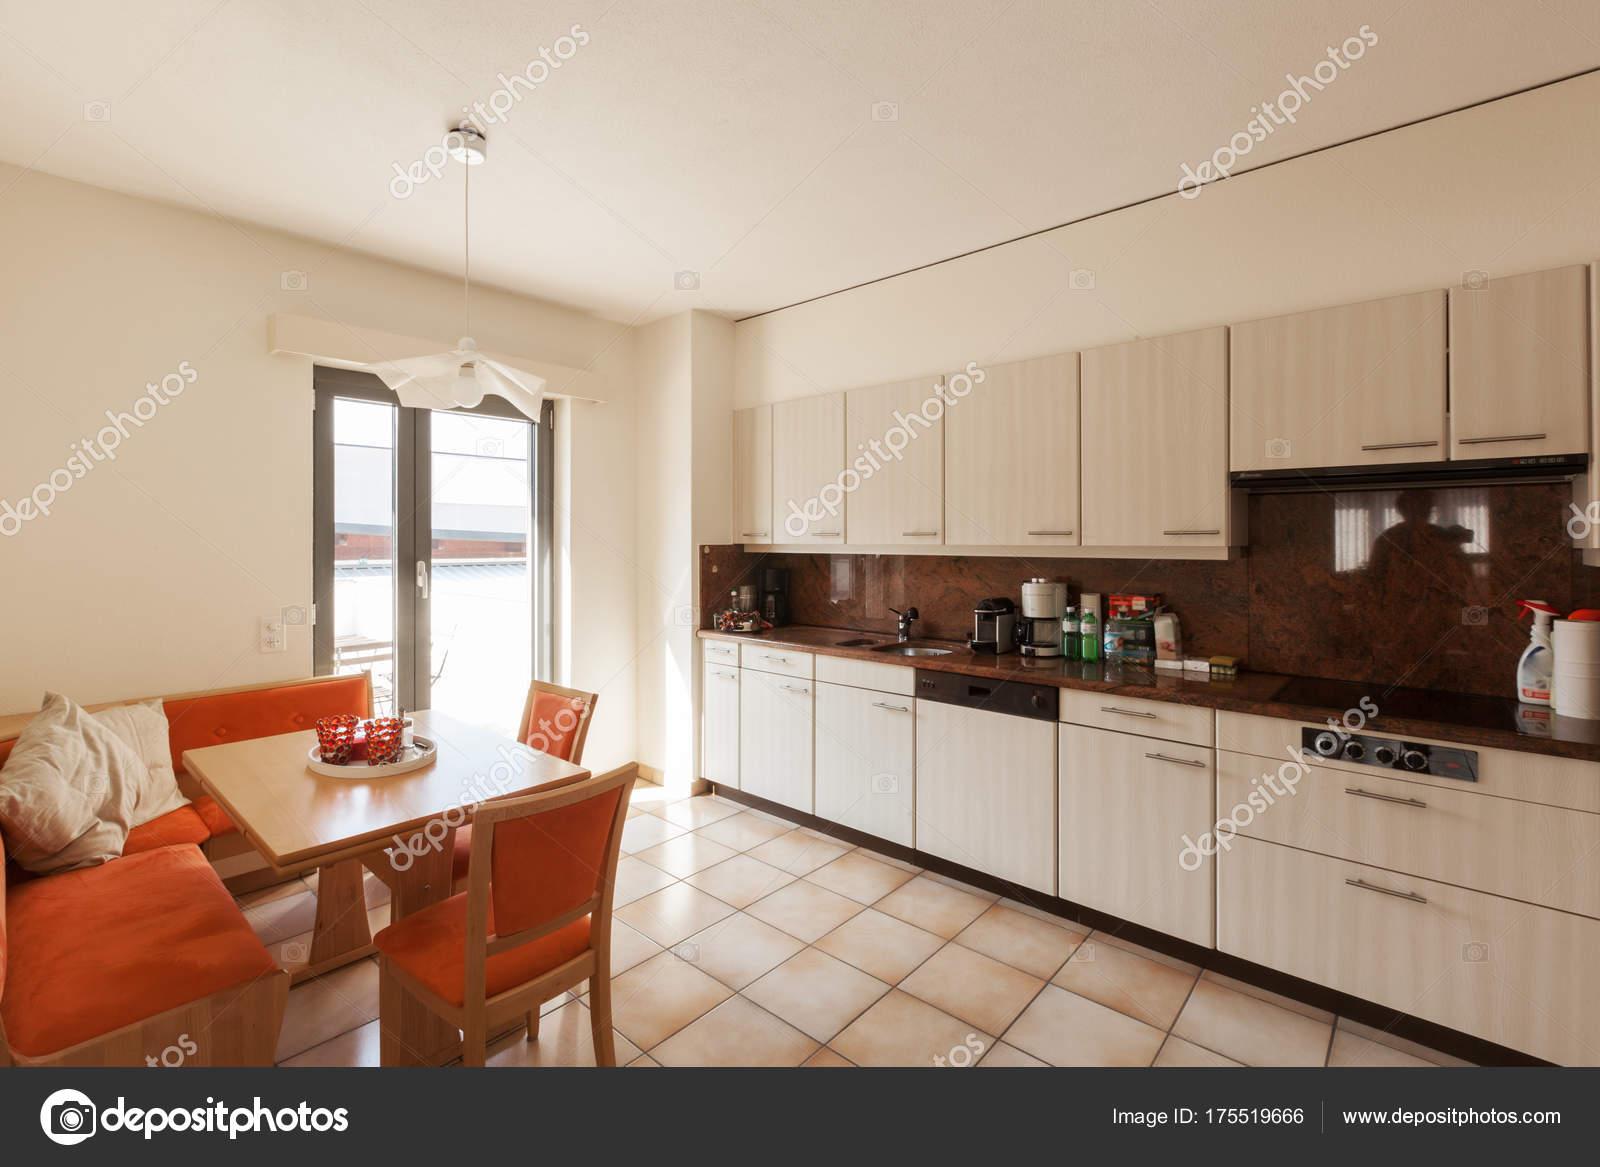 Moderna Casa Interior Cozinha Stock Photo Zveiger 175519666